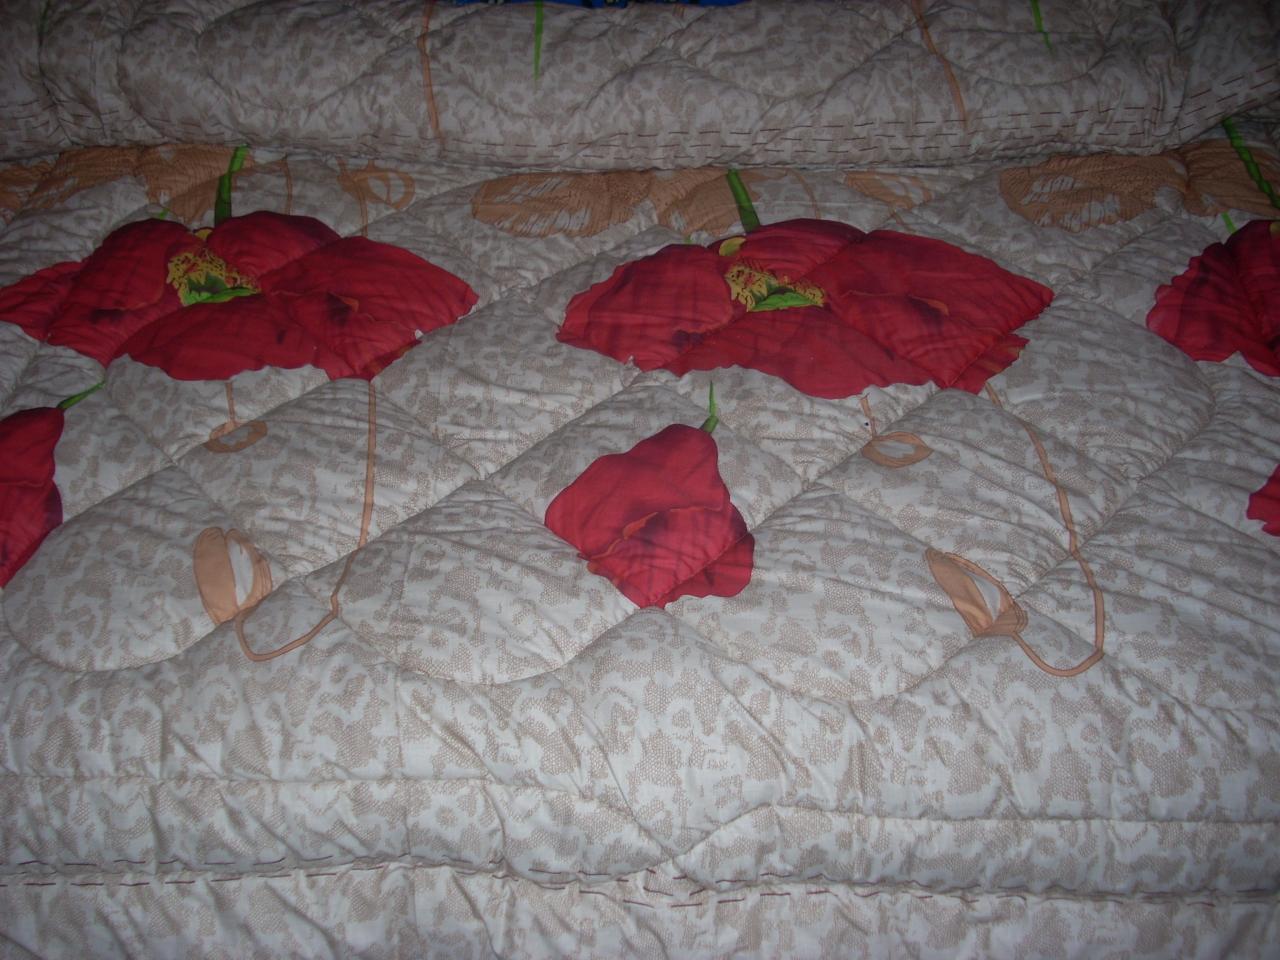 Стеганое одеяло из шерсти своими руками мастер класс 72